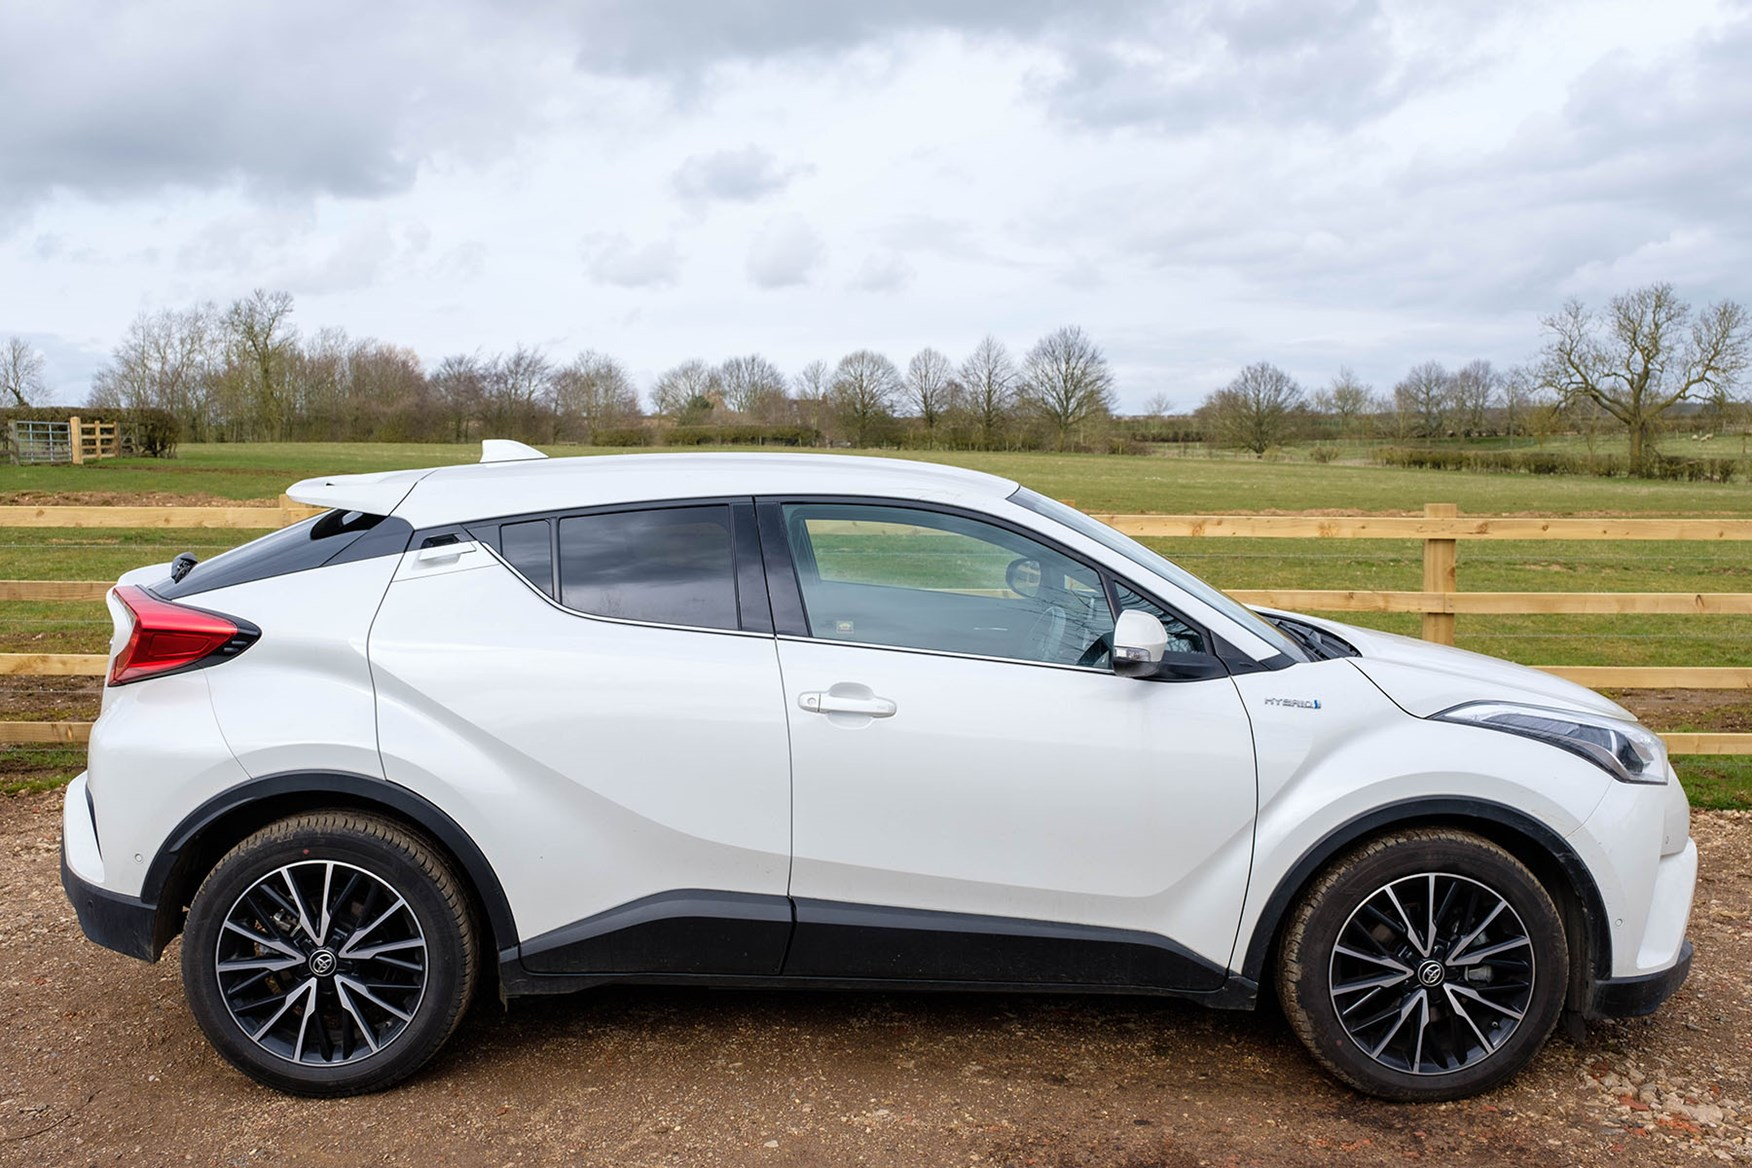 2017 Toyota C-HR Side View - white, Excel Hybrid